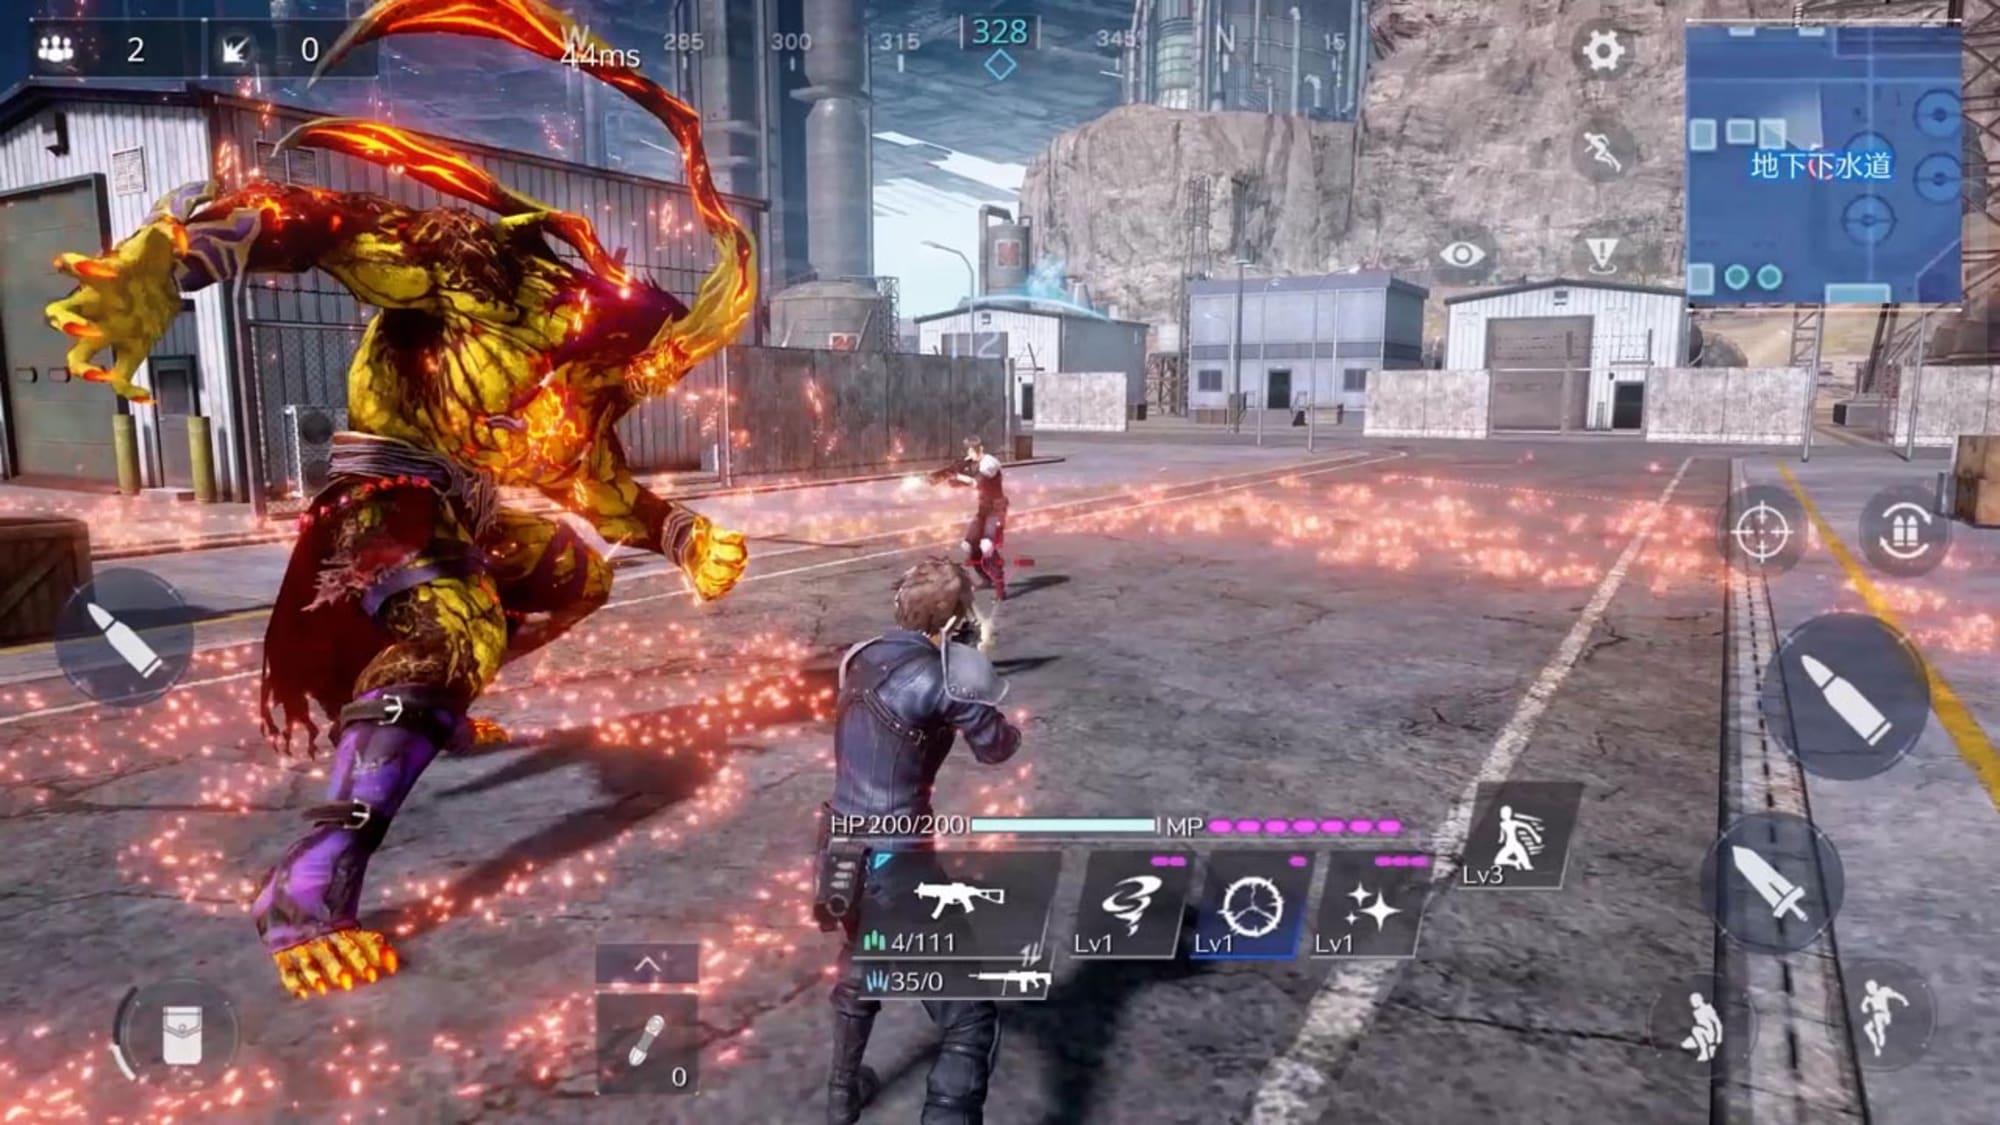 Final Fantasy VII monsters